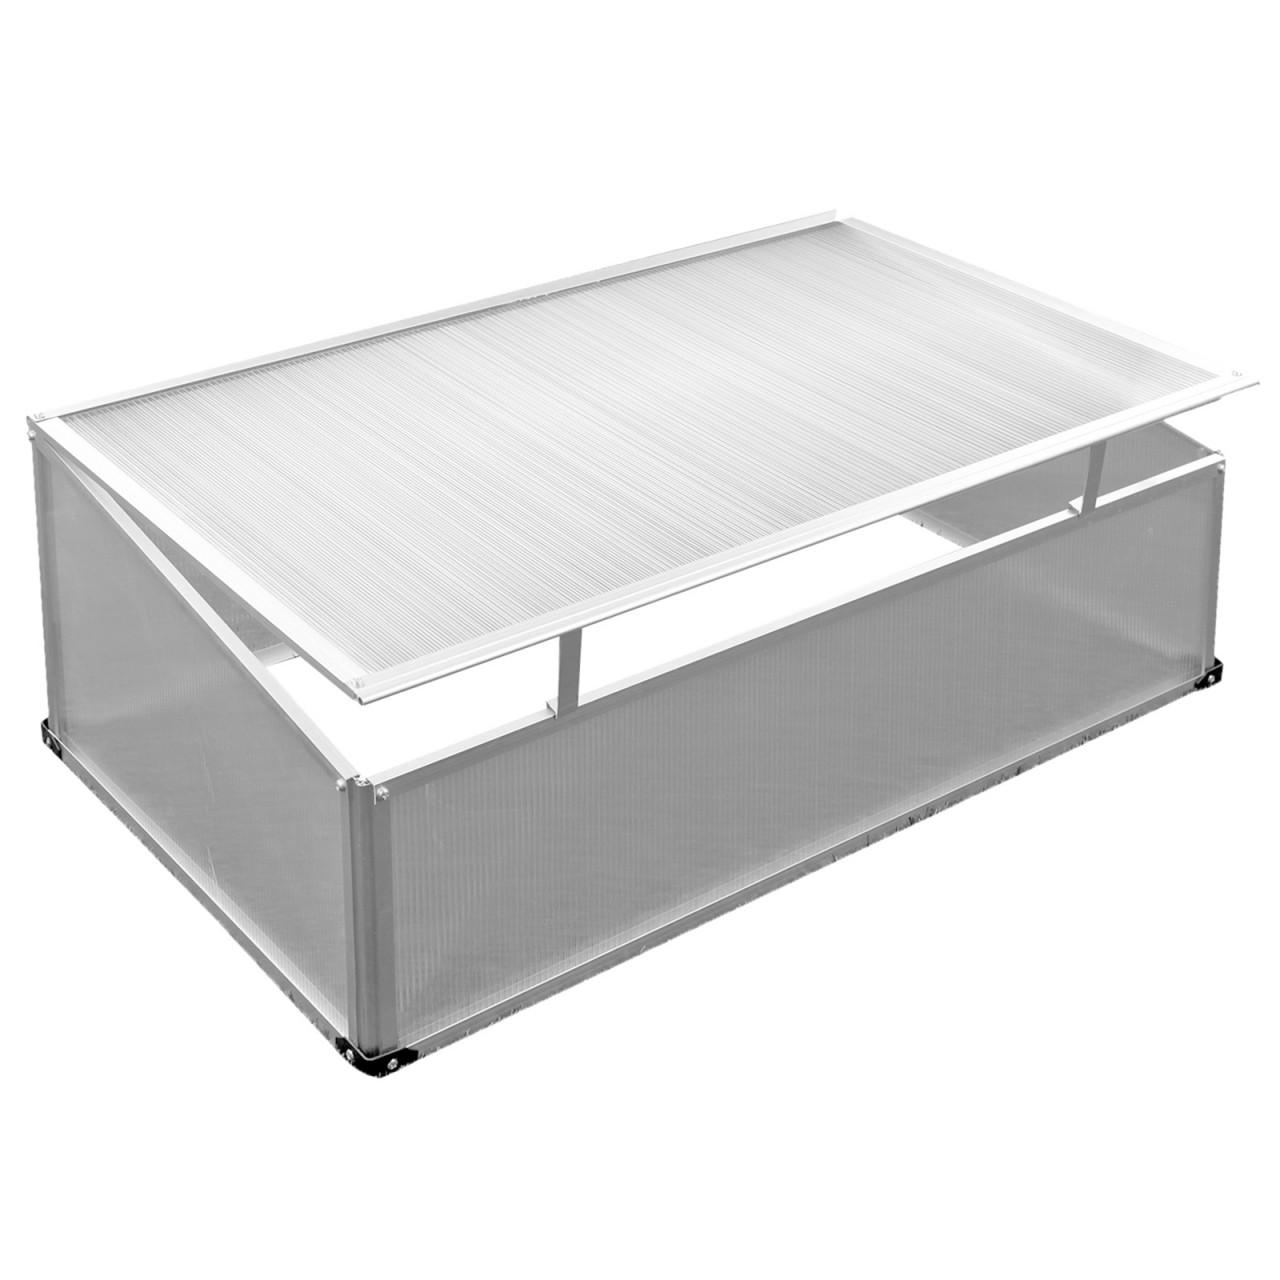 LEX Frühbeet, Aluminium-Rahmen, PC-Scheiben, 120 x 80 x 30/40cm | eBay